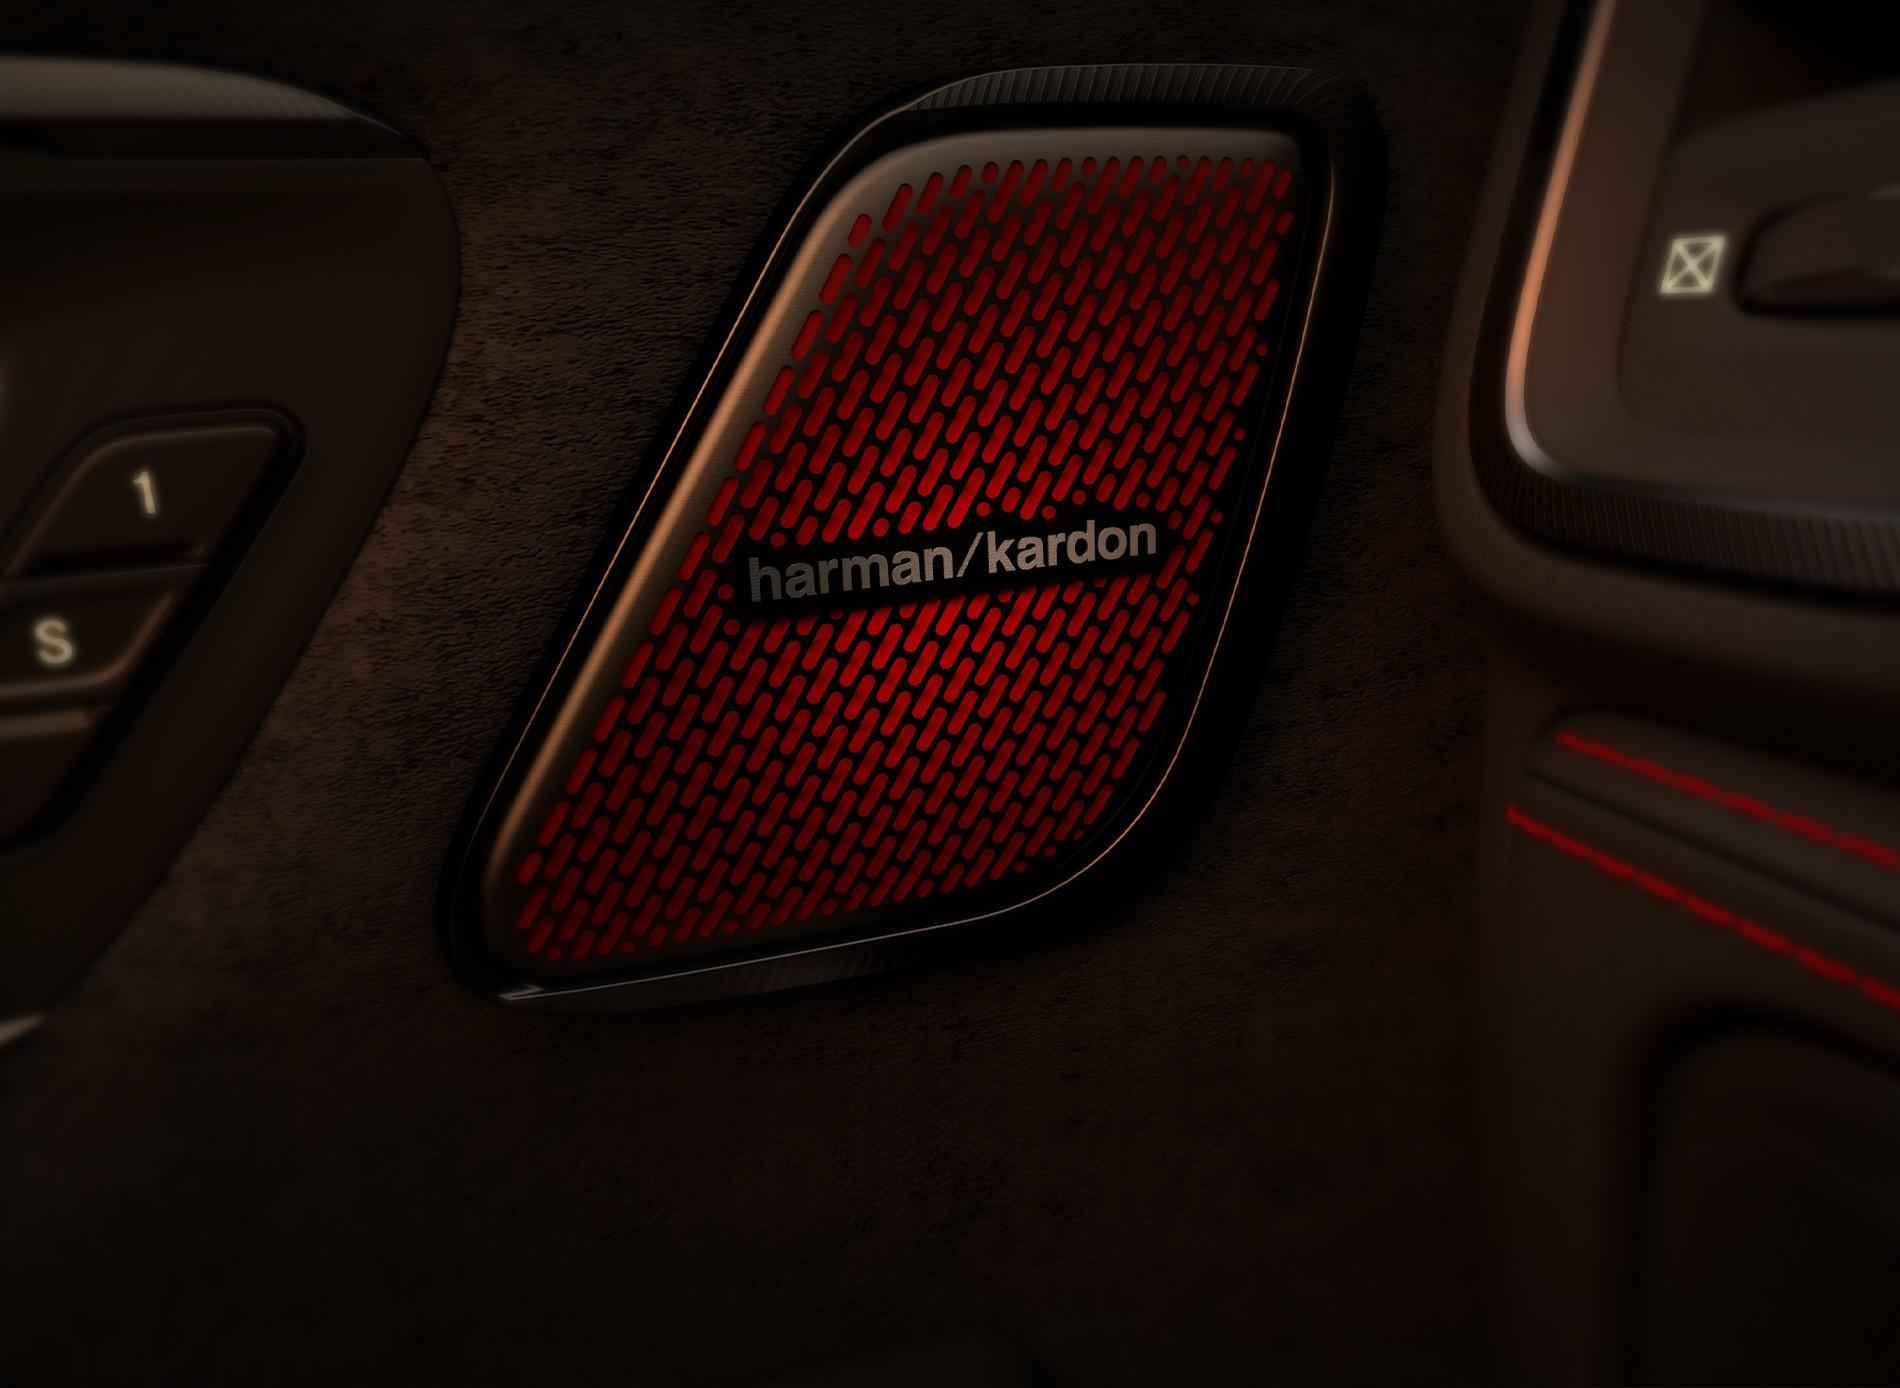 2021 RAM 1500 TRX at Wellington Chrysler Dodge Jeep Ram